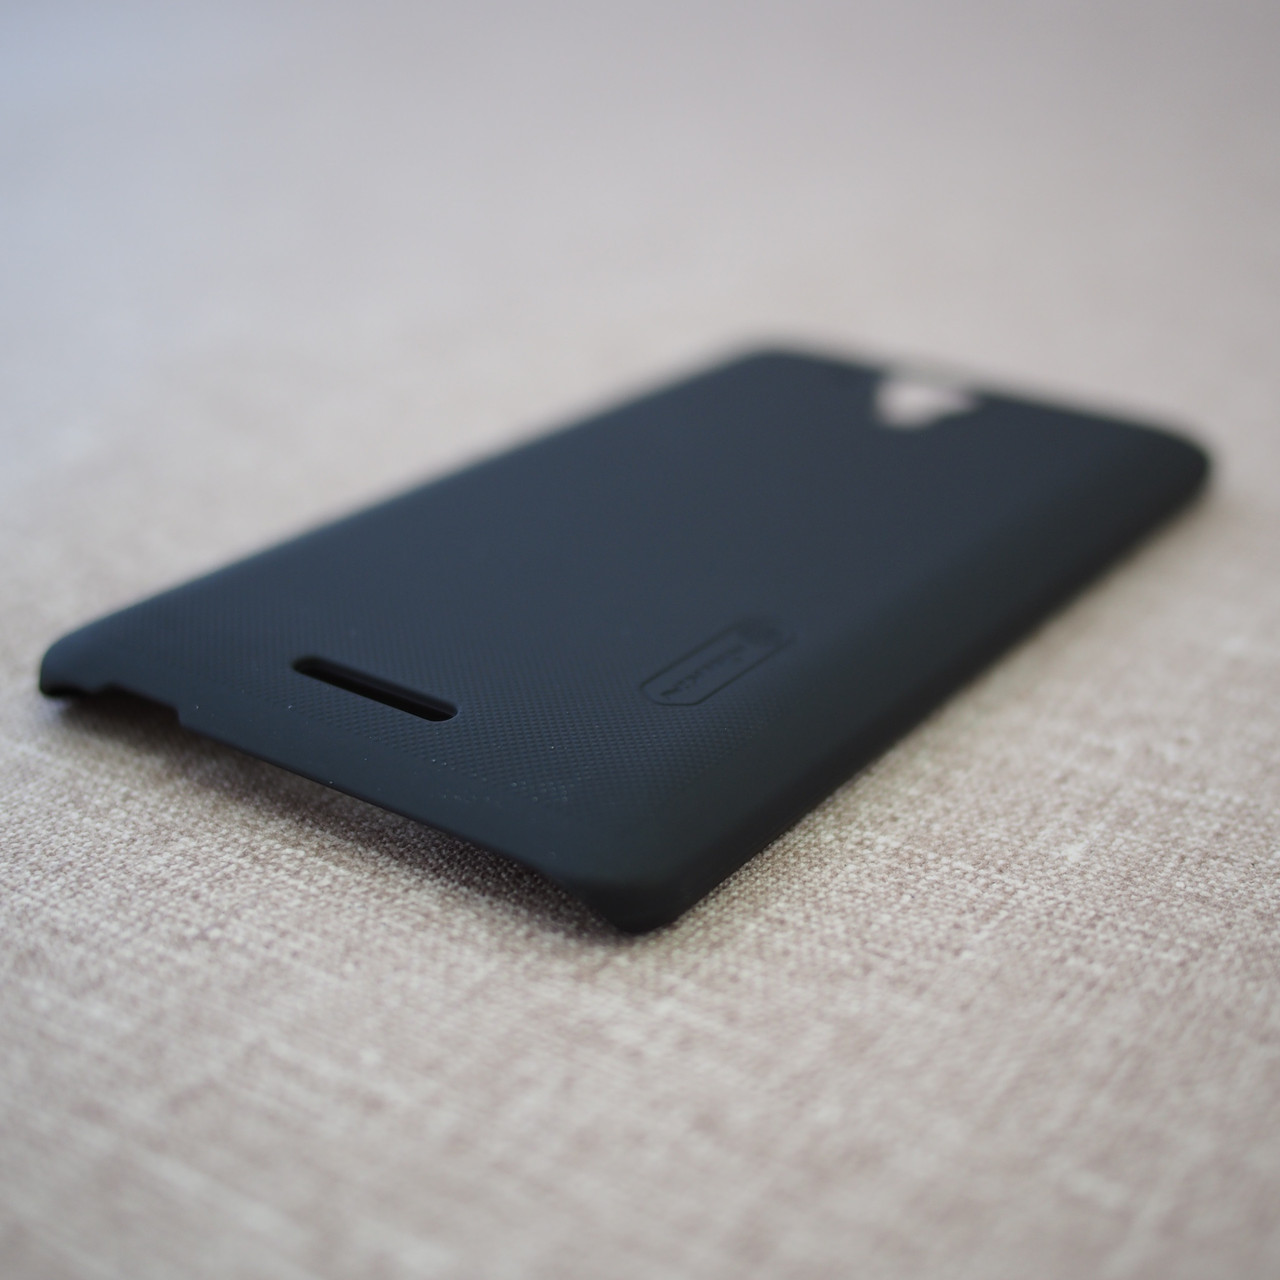 Nillkin Super Frosted Shield Lenovo S8 black Для телефона